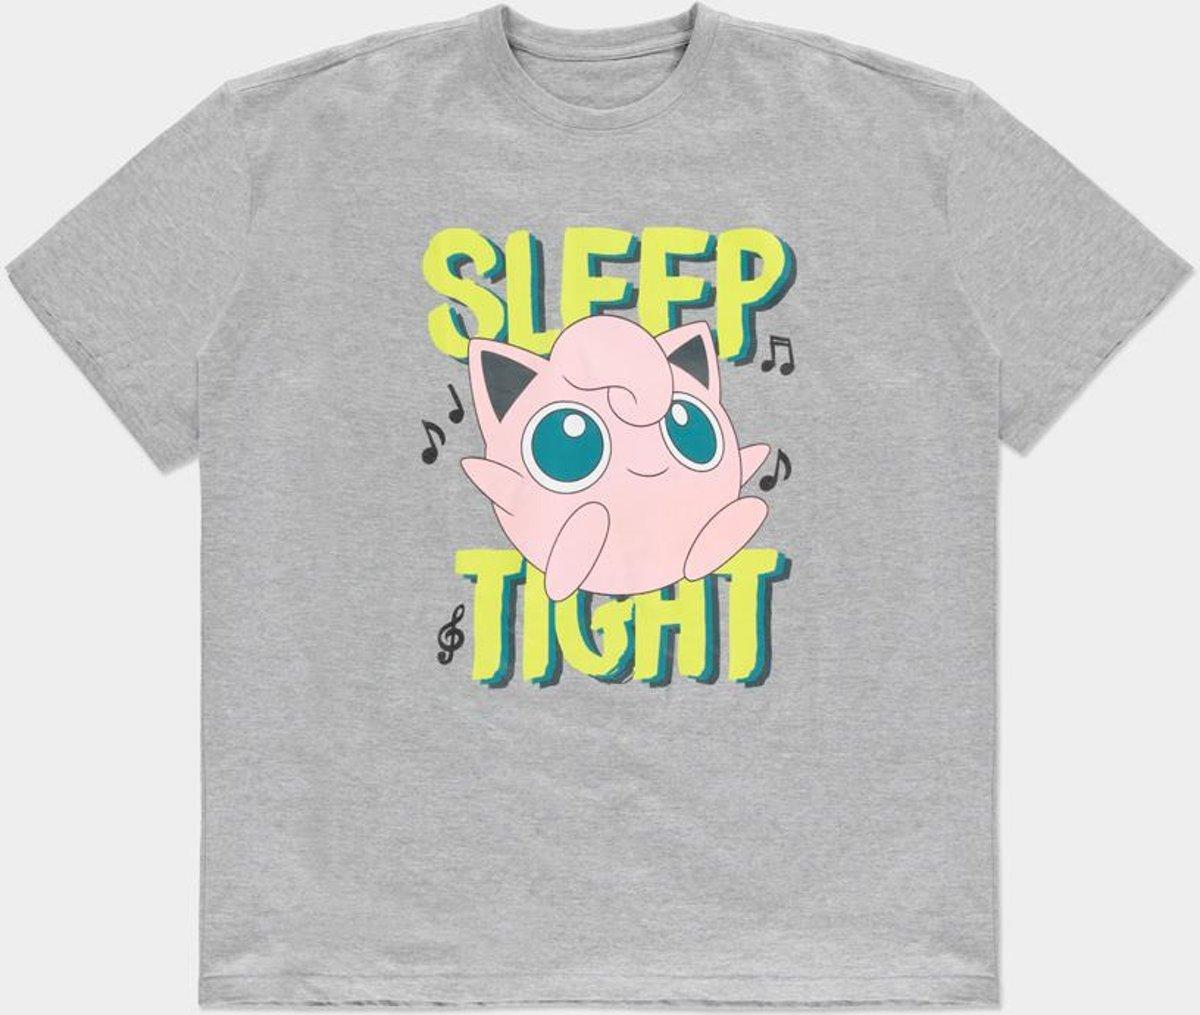 Pokémon - Jigglypuff Oversized Women's T-shirt - M kopen